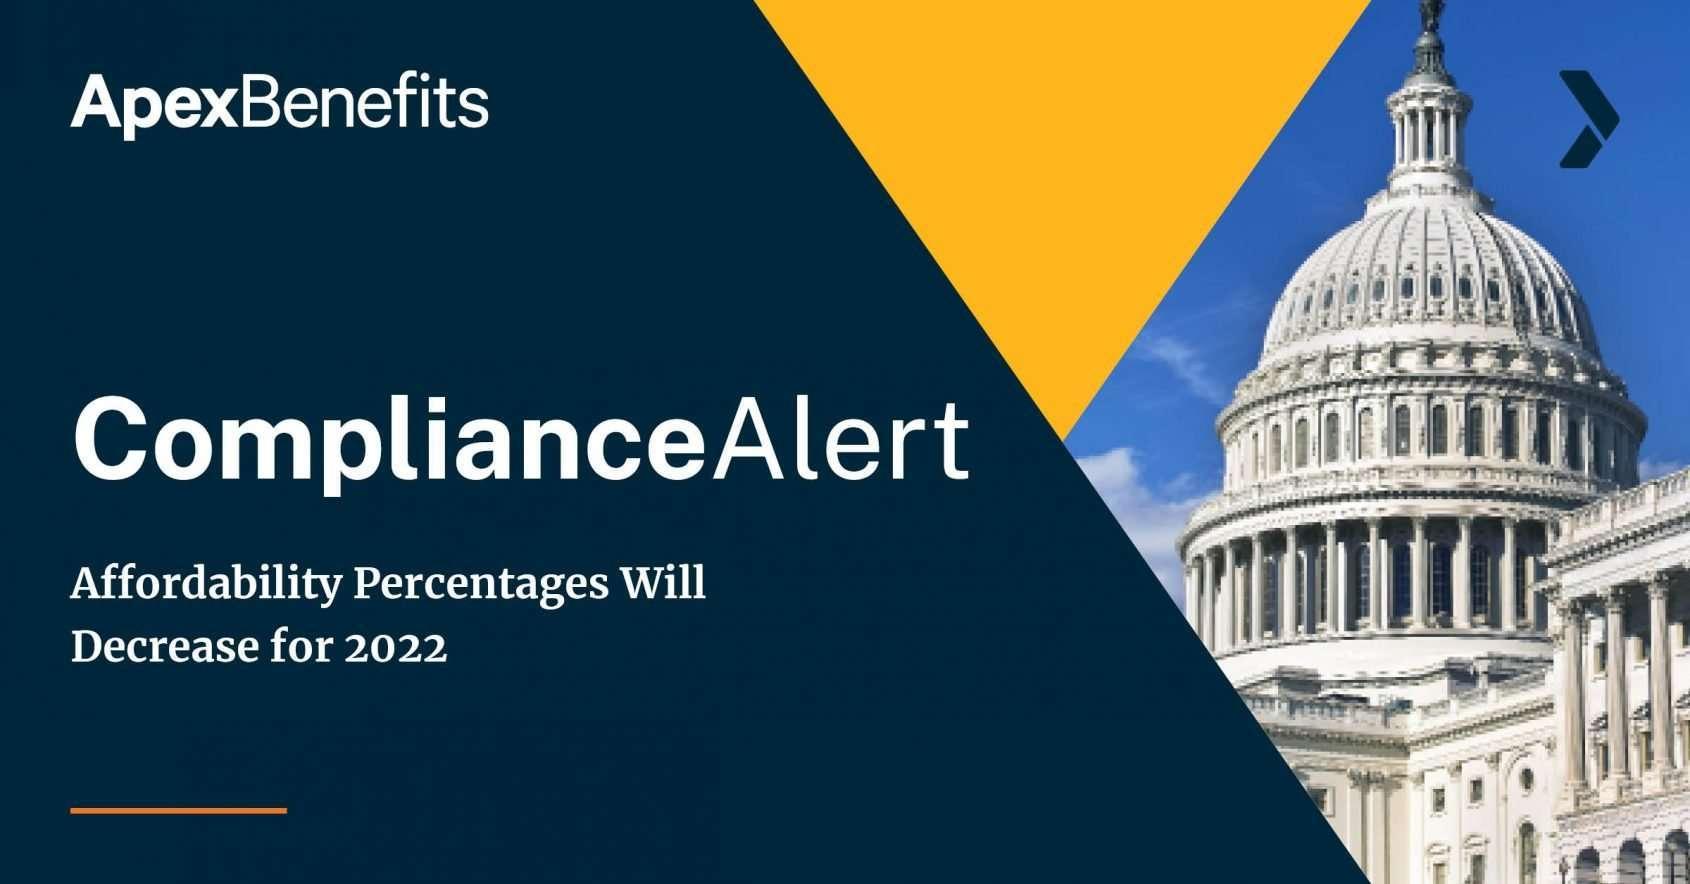 CA Affordability Percentages 2022